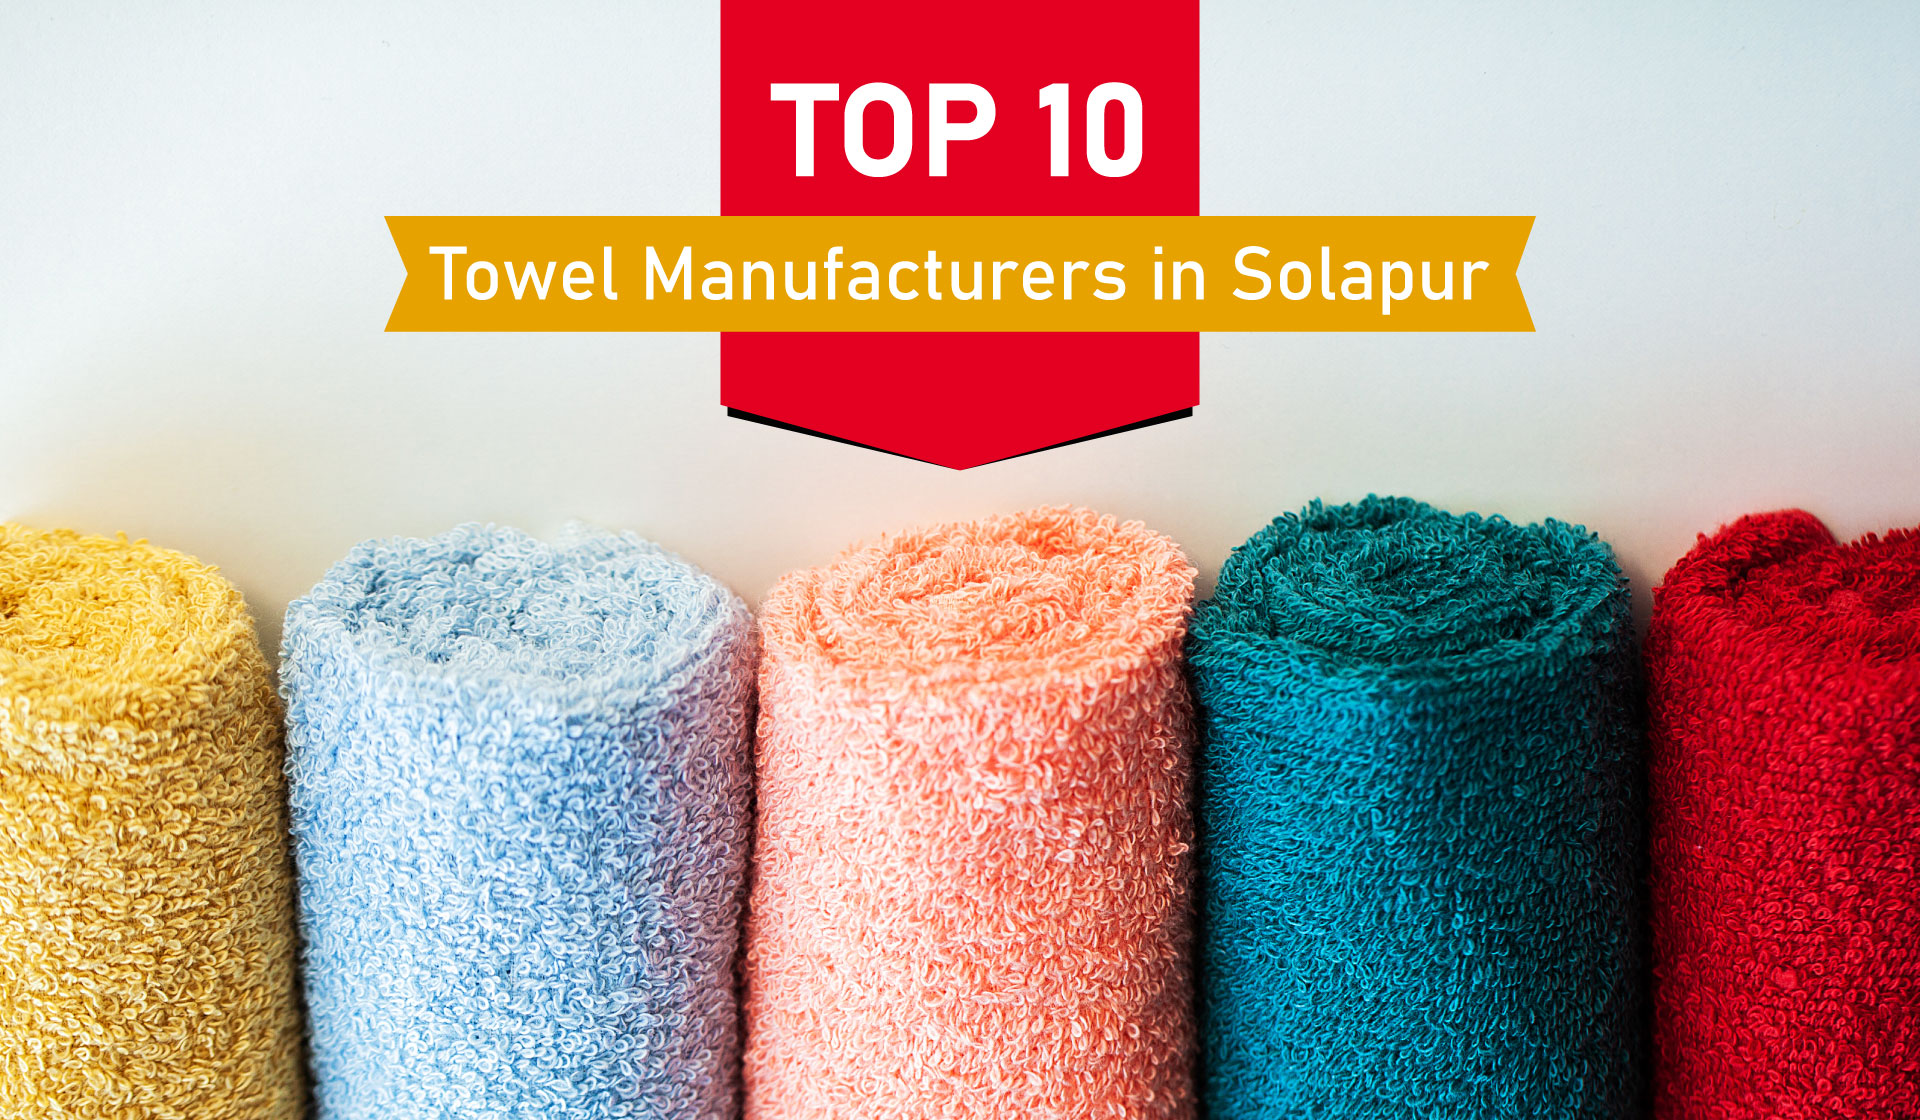 Top 10 Towel Manufacturers in Solapur